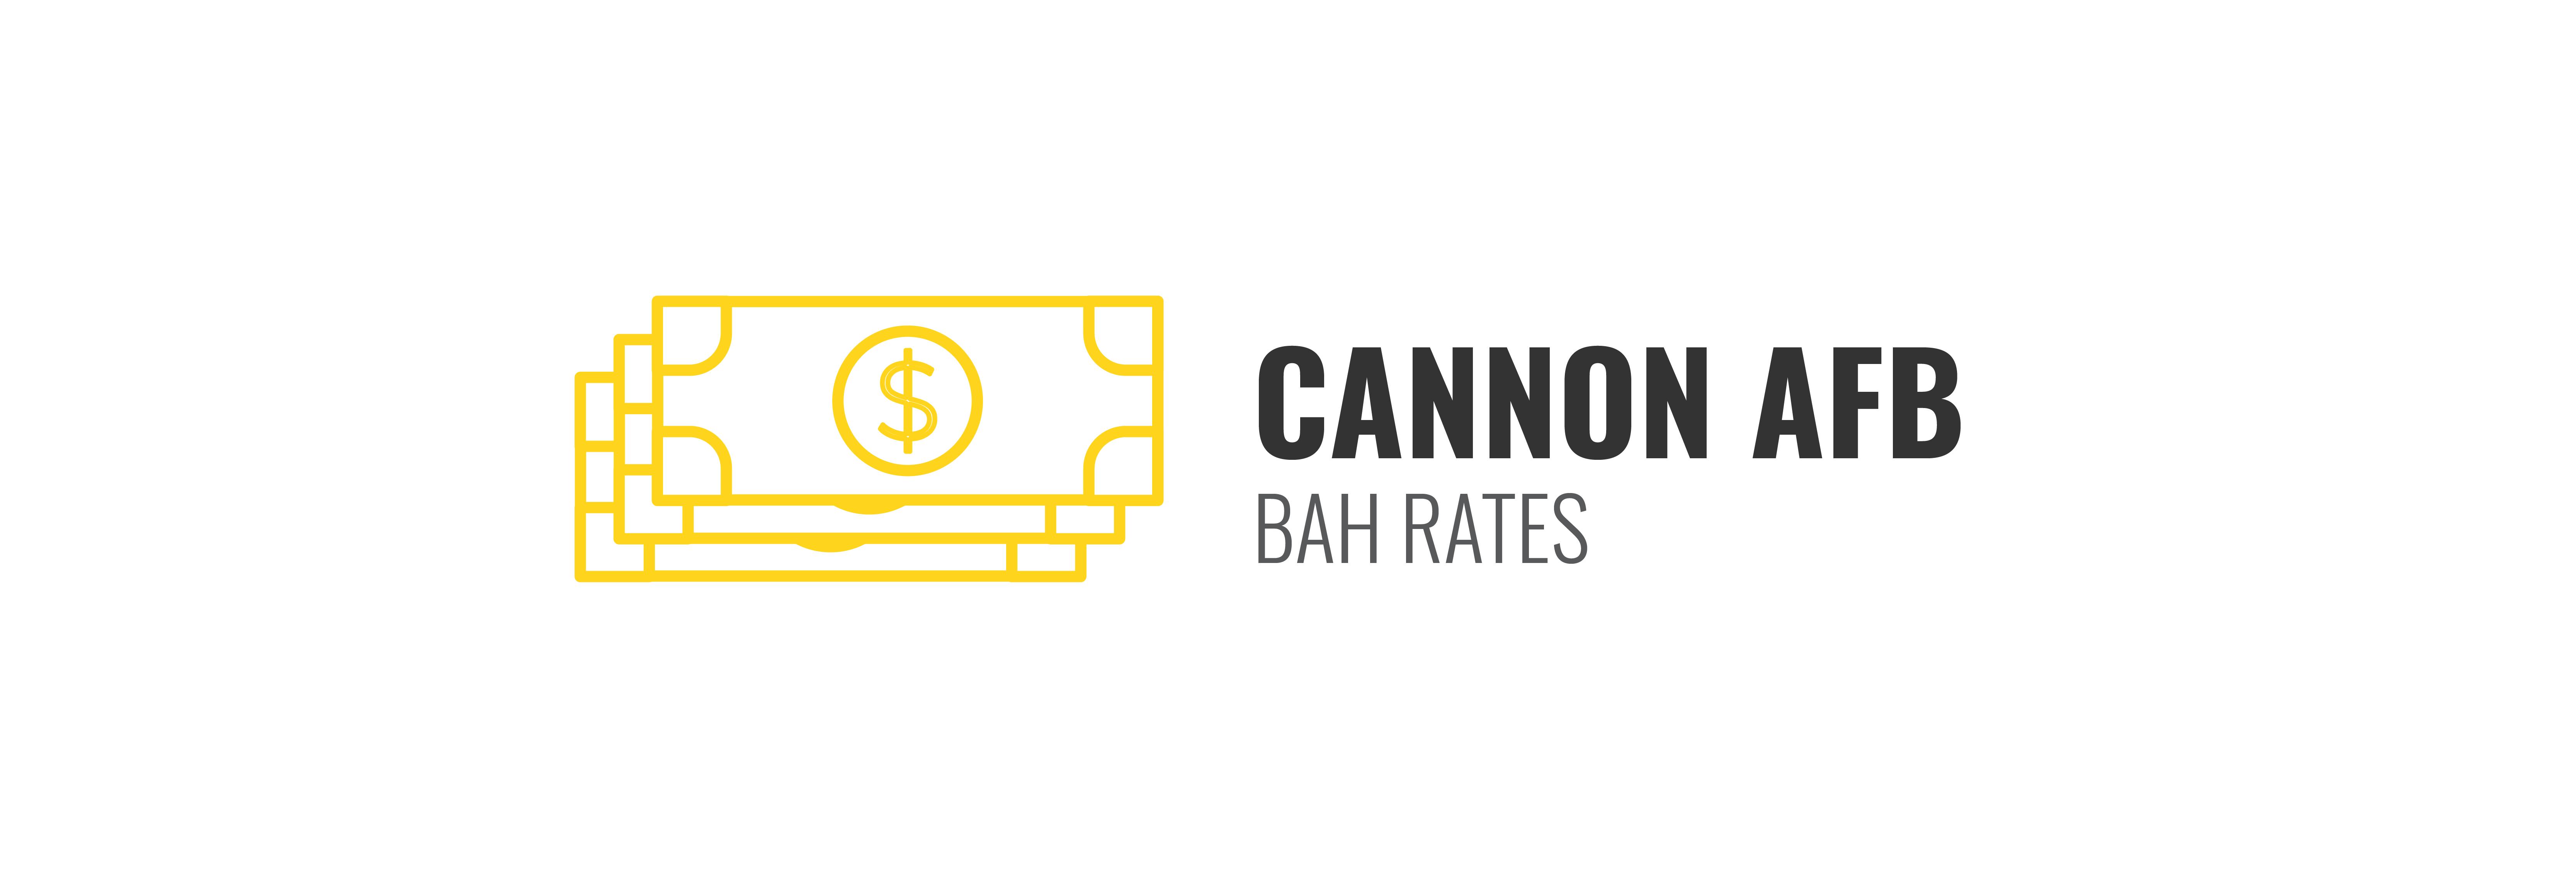 Cannon BAH Rates